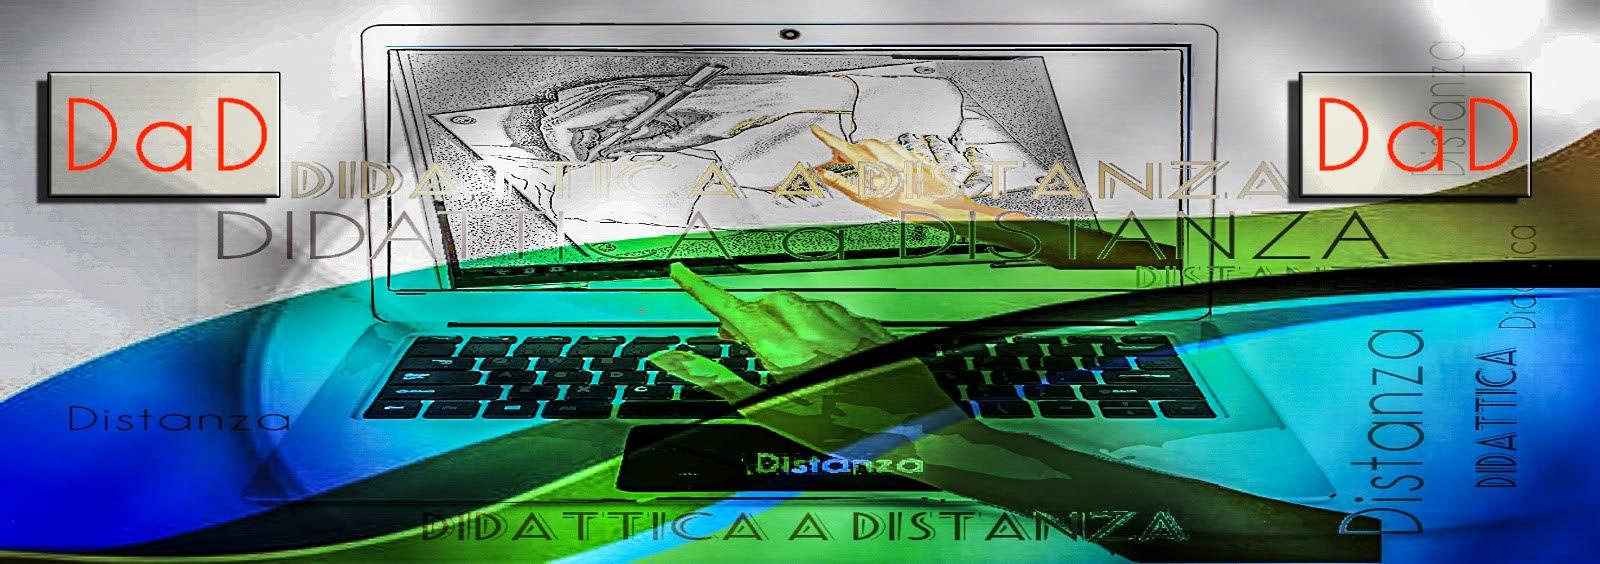 didattica-a-distanza